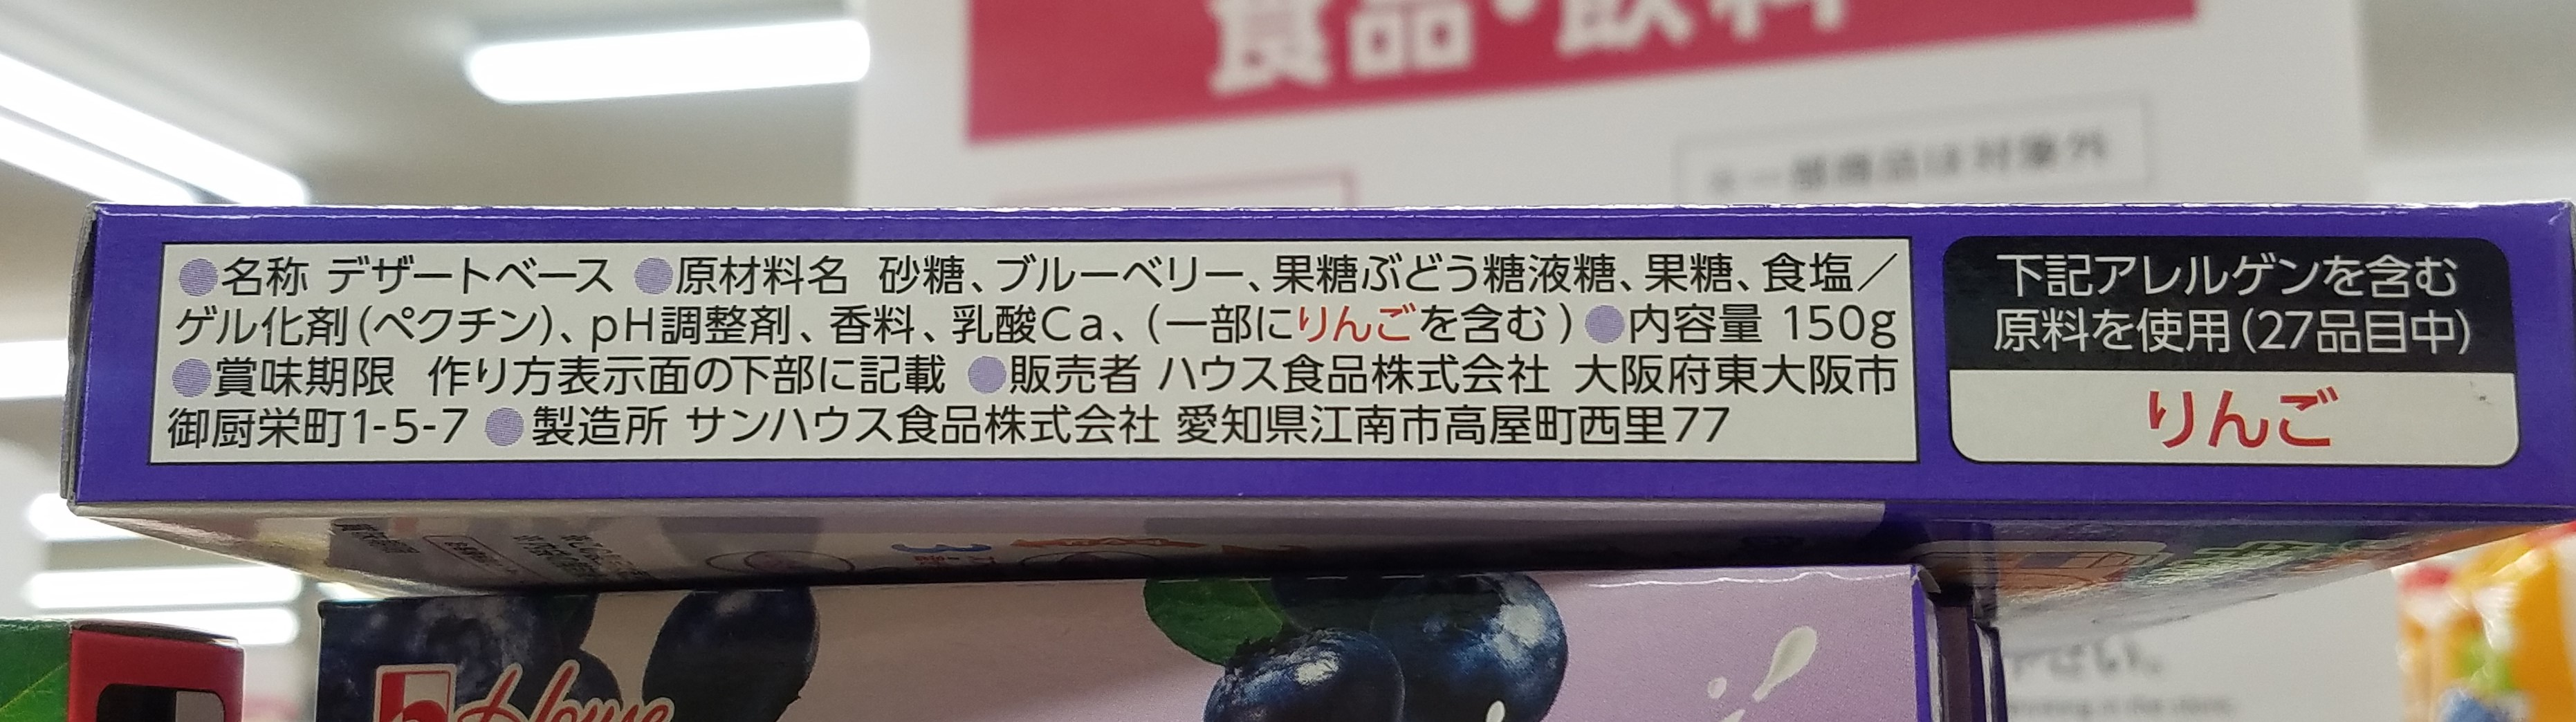 20191102_164130 (2)